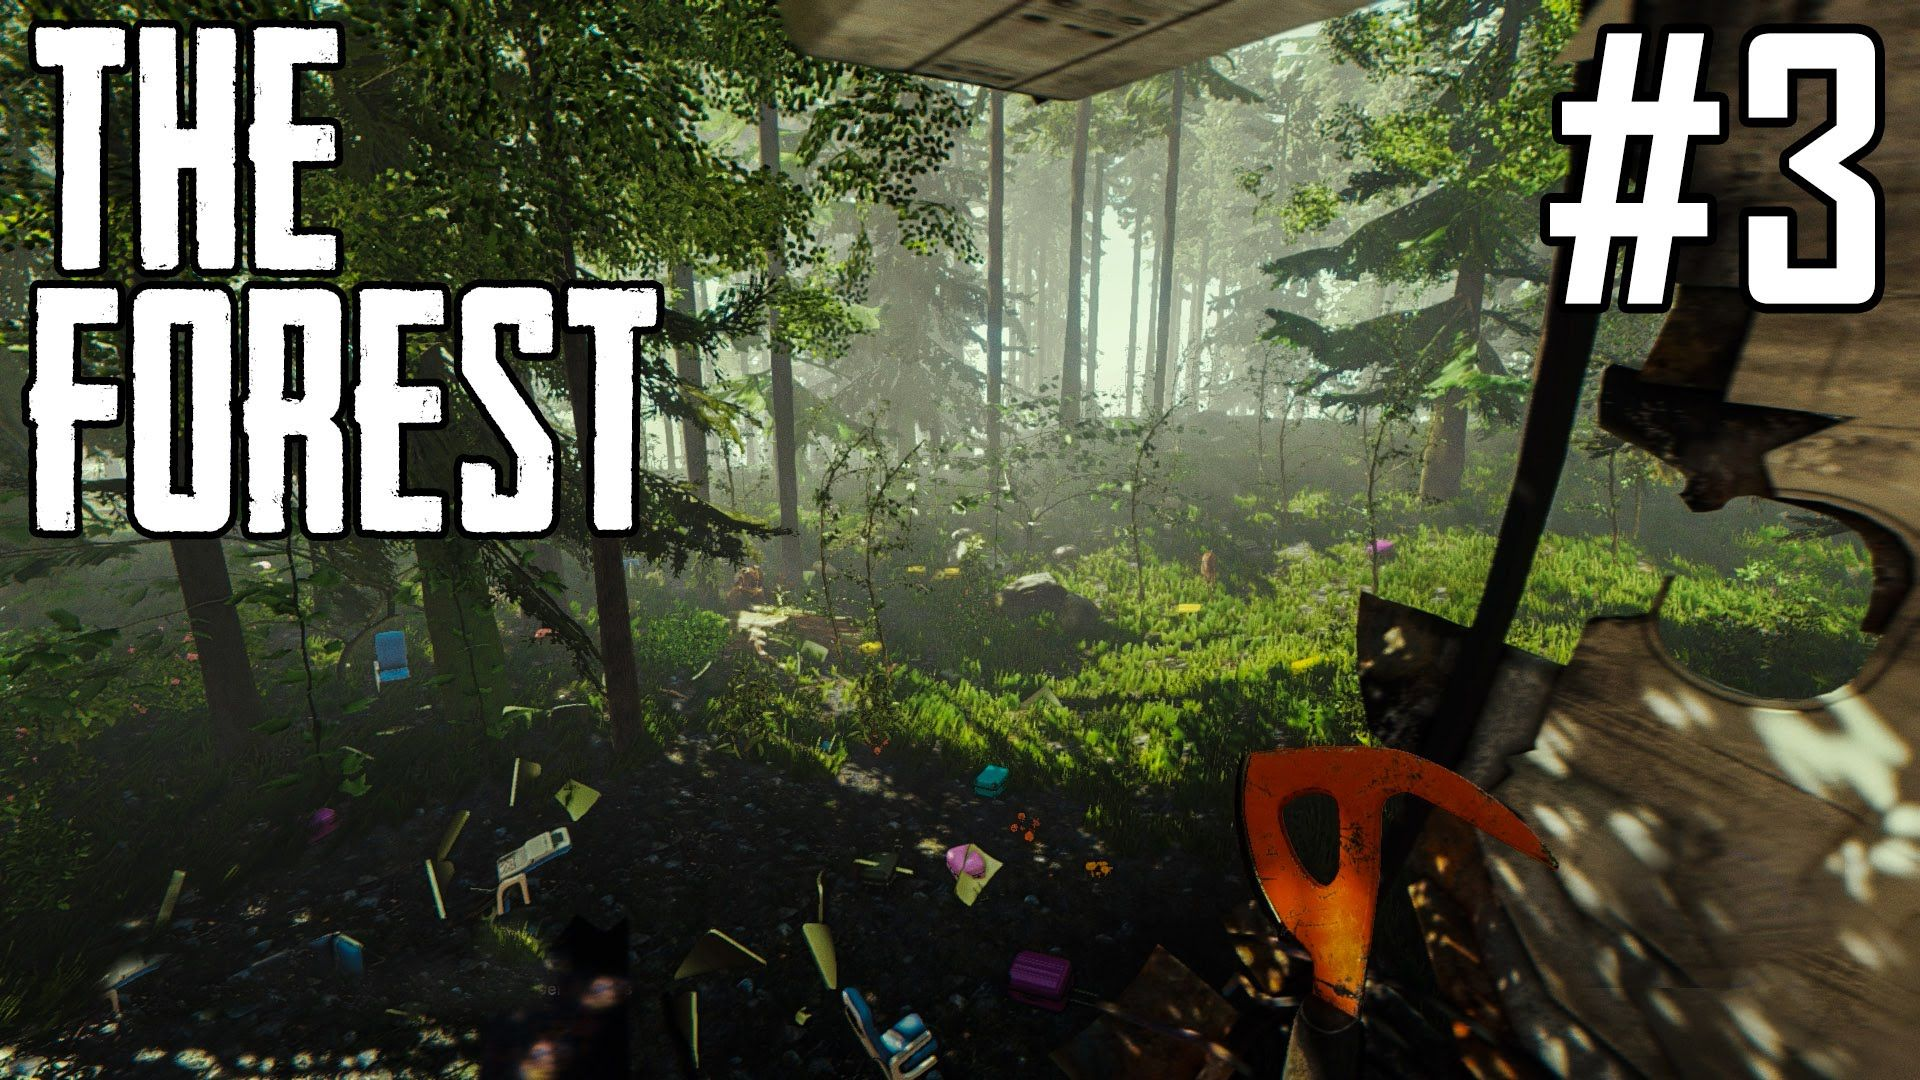 THE FOREST Gameplay German # 3  Erneuter Besuc #vr #virtualreality #oculus #oculusrift #gearvr #htcvivve #projektmorpheus #cardboard #video #videos